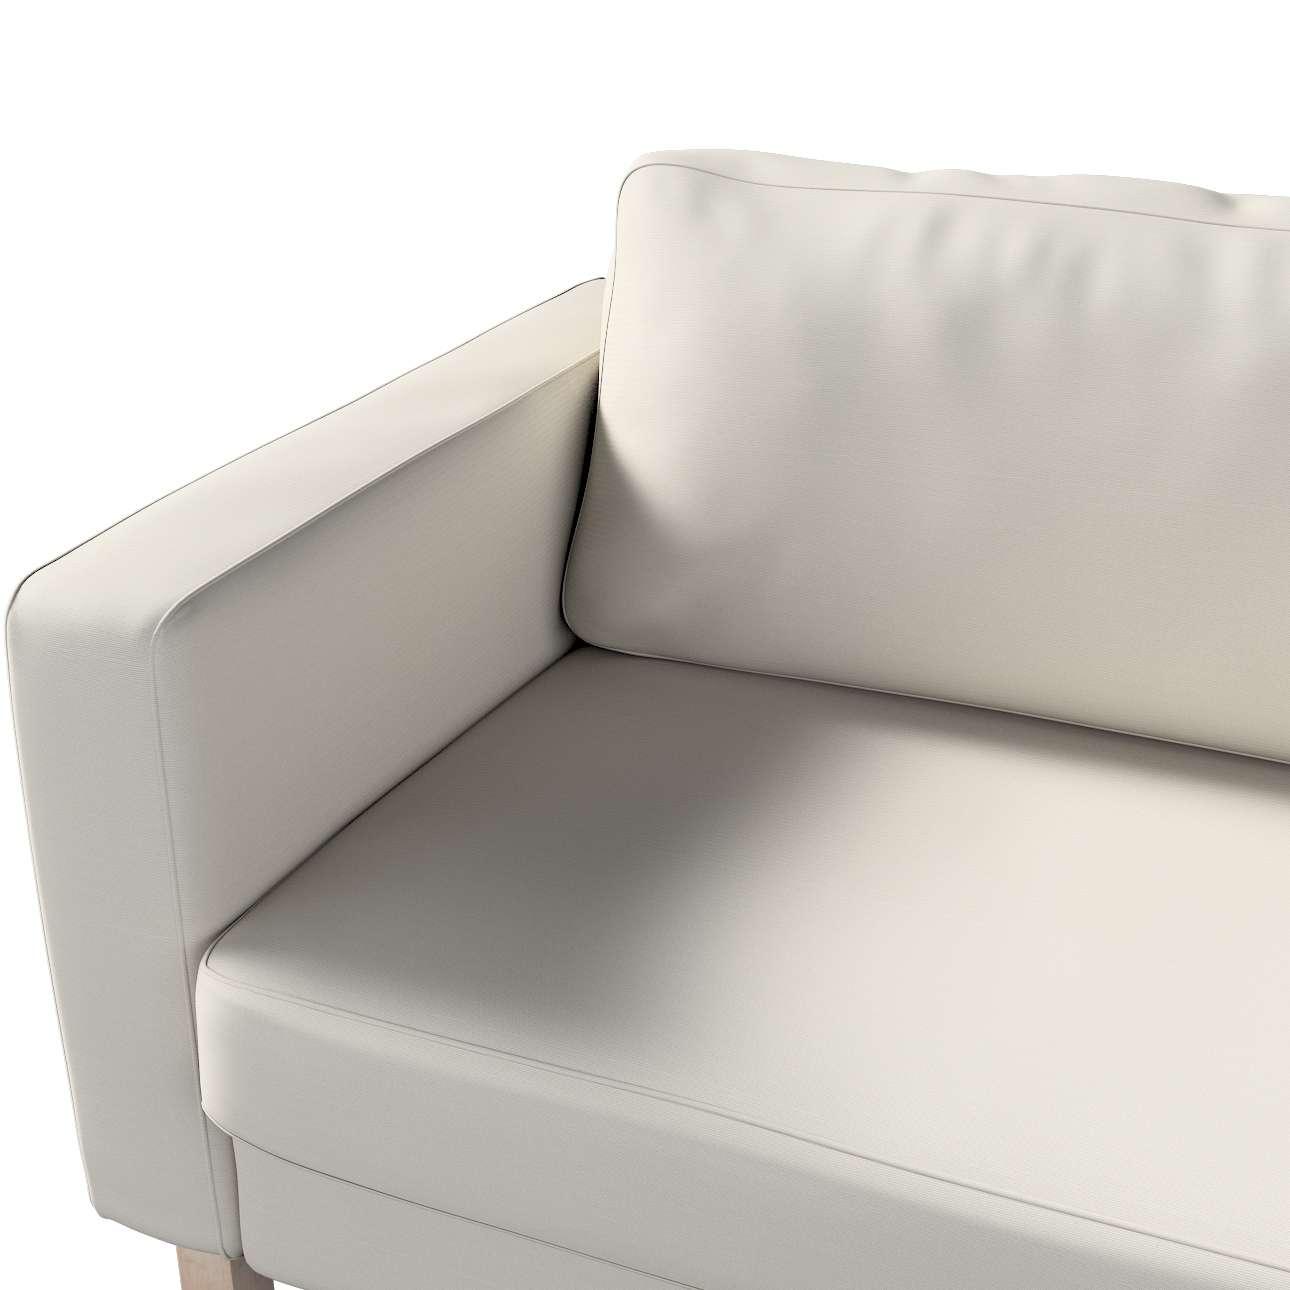 Karlstad betræk 3 personer 204cm fra kollektionen Cotton Panama, Stof: 702-31